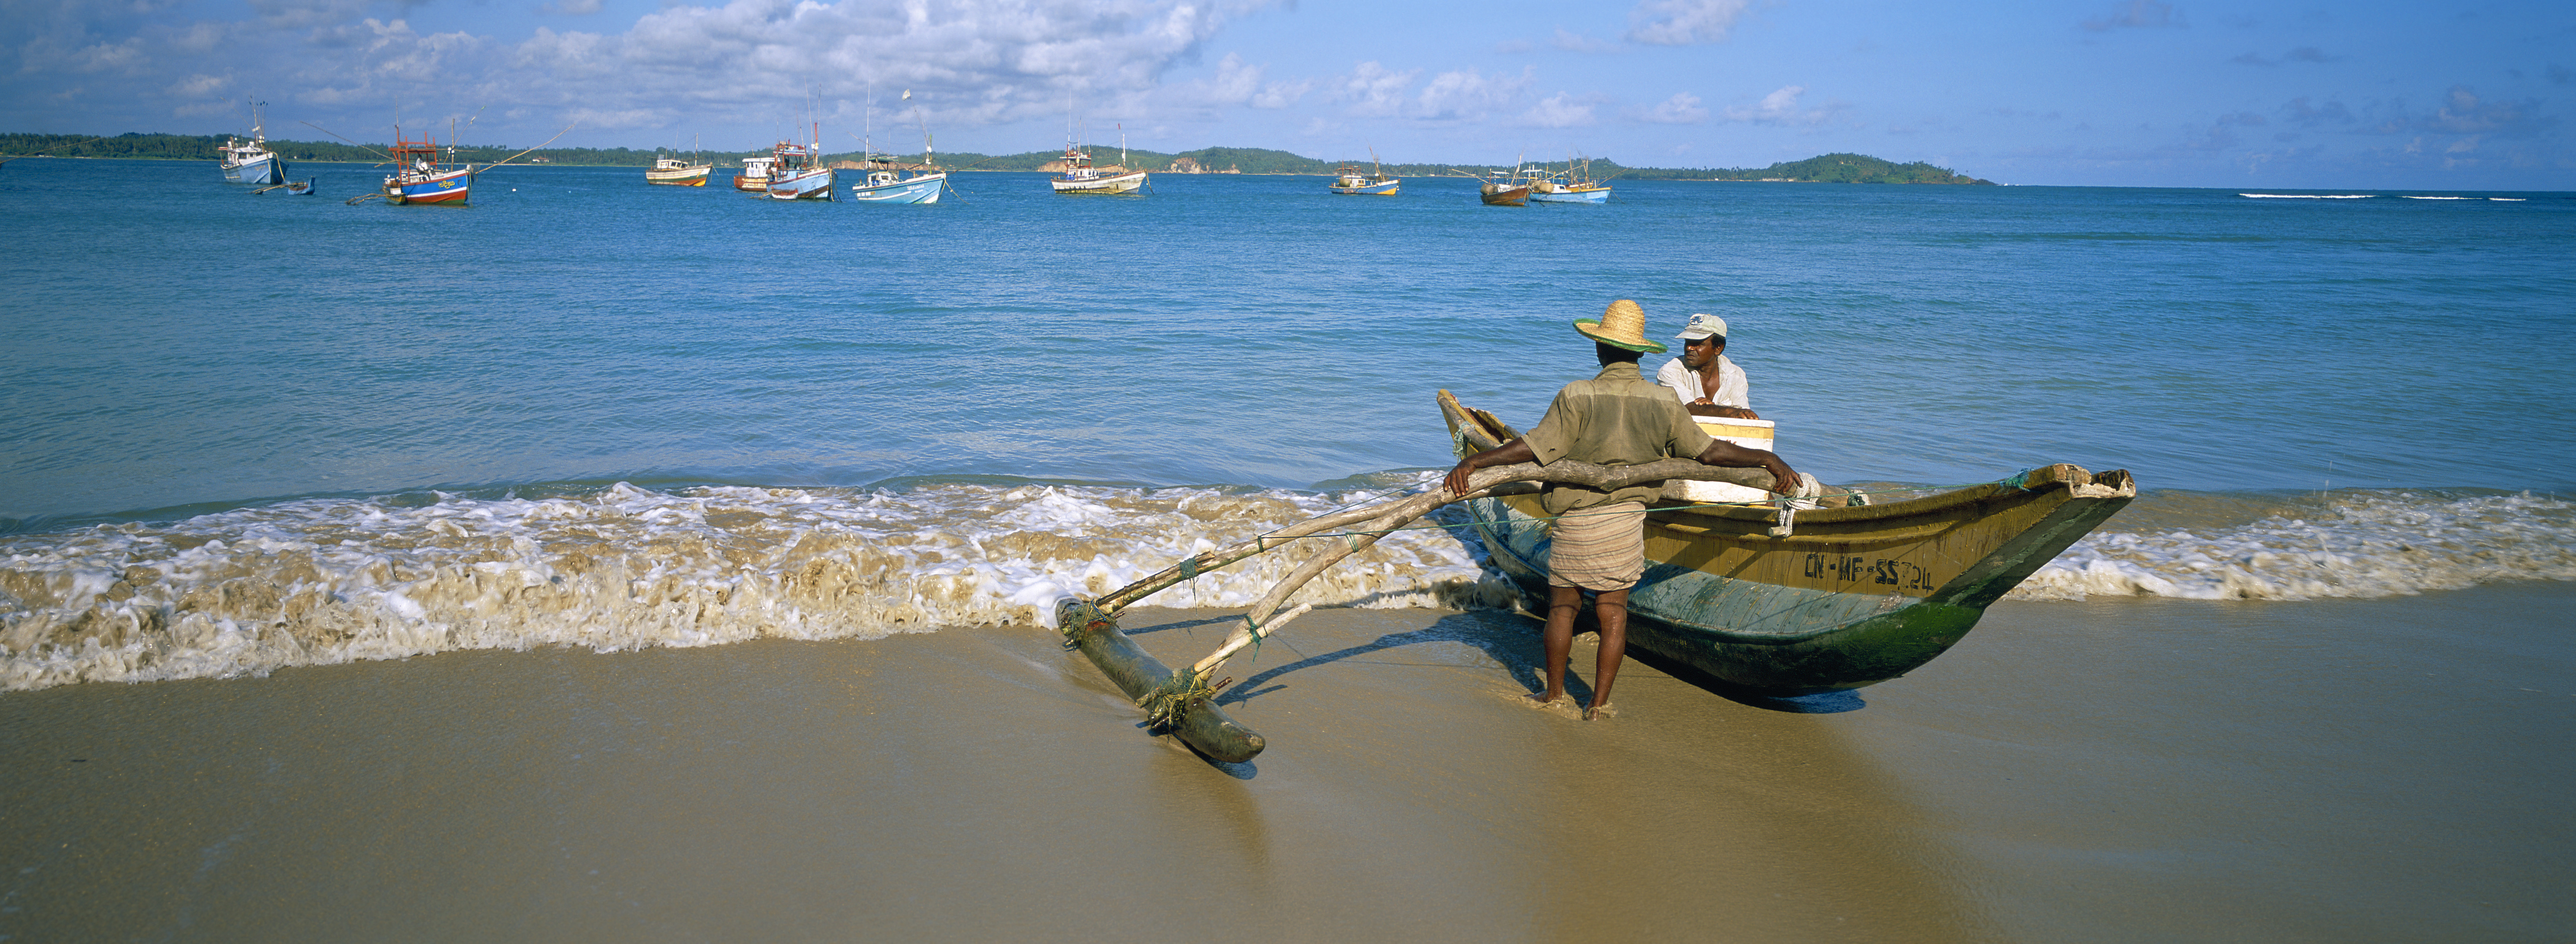 Weligama beach - Fisherman - South coast - Sri Lanka